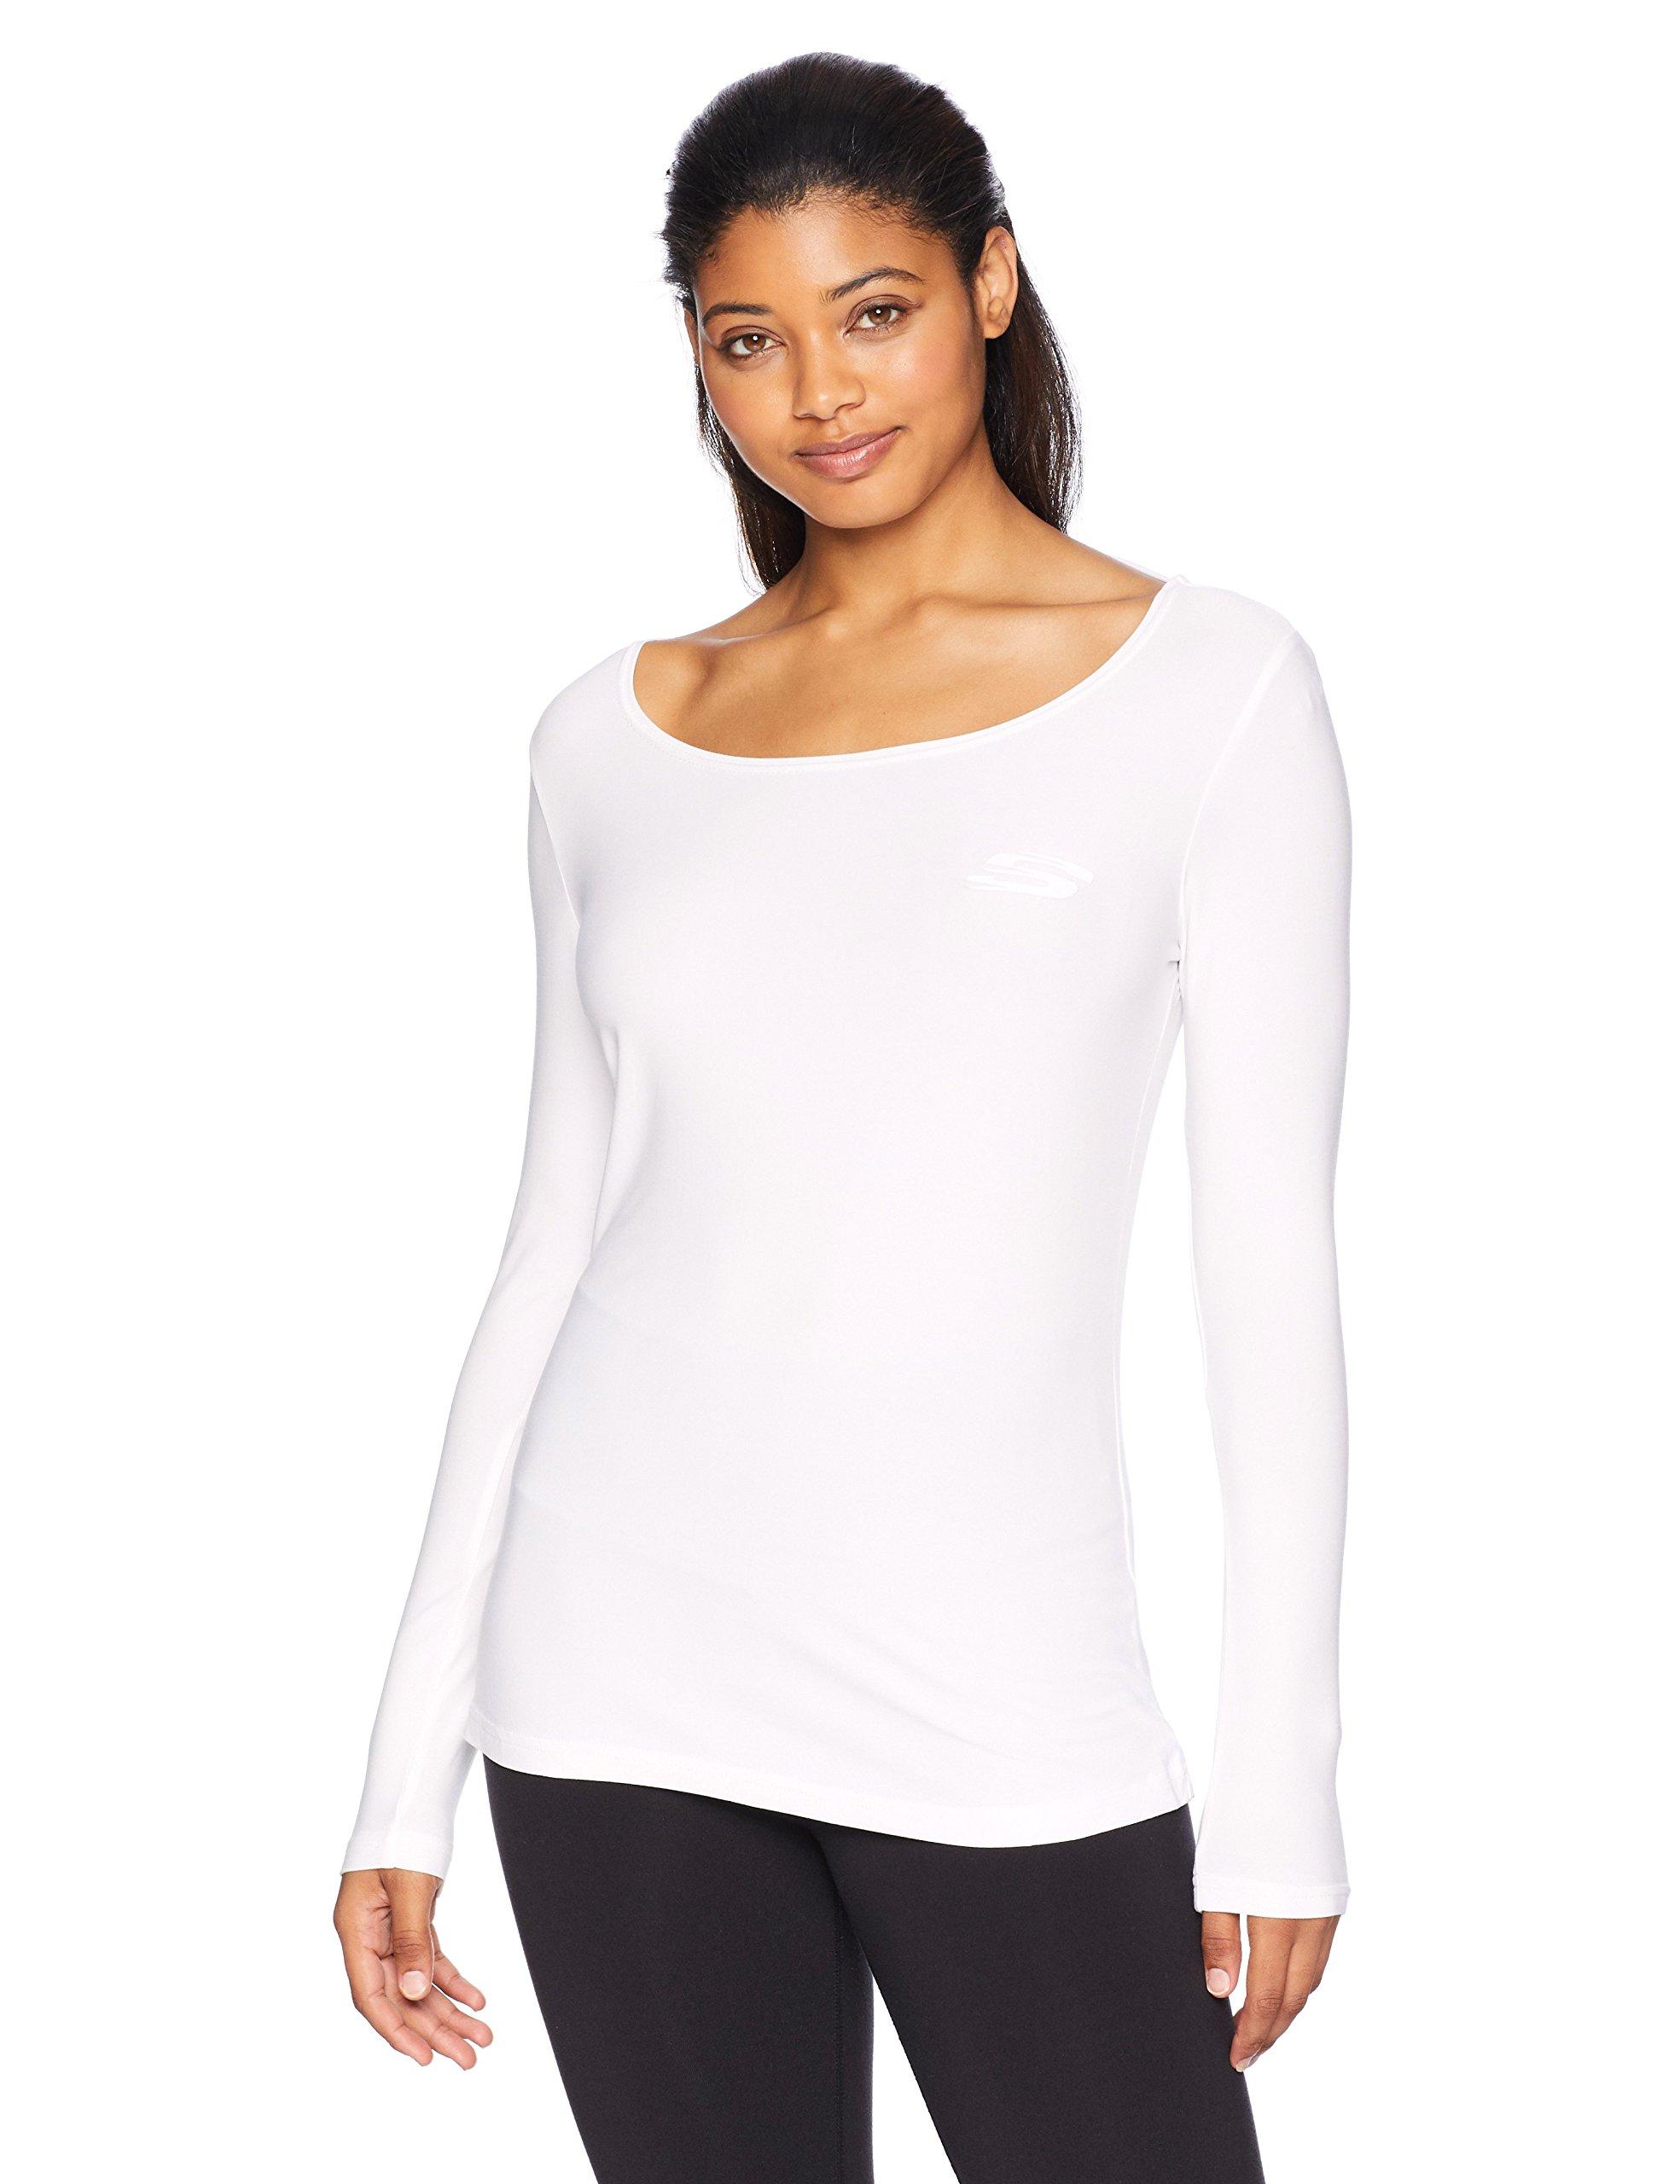 Skechers Active Women's Twist Back Long Sleeve Top, White, XS